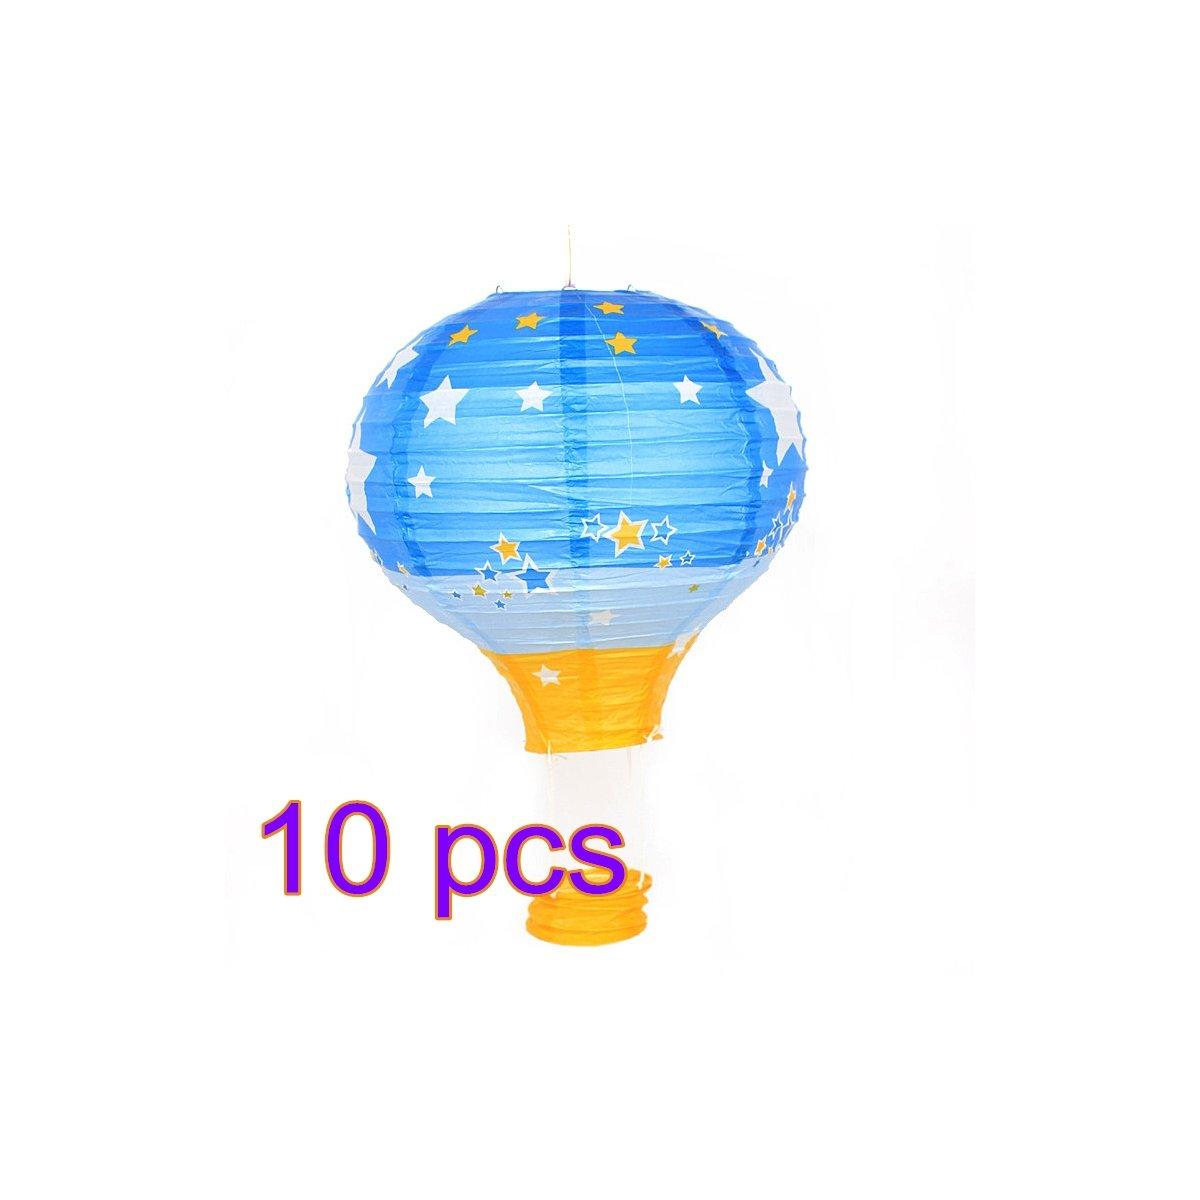 tueselesoleil Lantern Ball Lamps Rainbow Printing Paper Lantern Colorful Hot Air Balloon for Wedding Party Birthday Stage Bar Market Decor